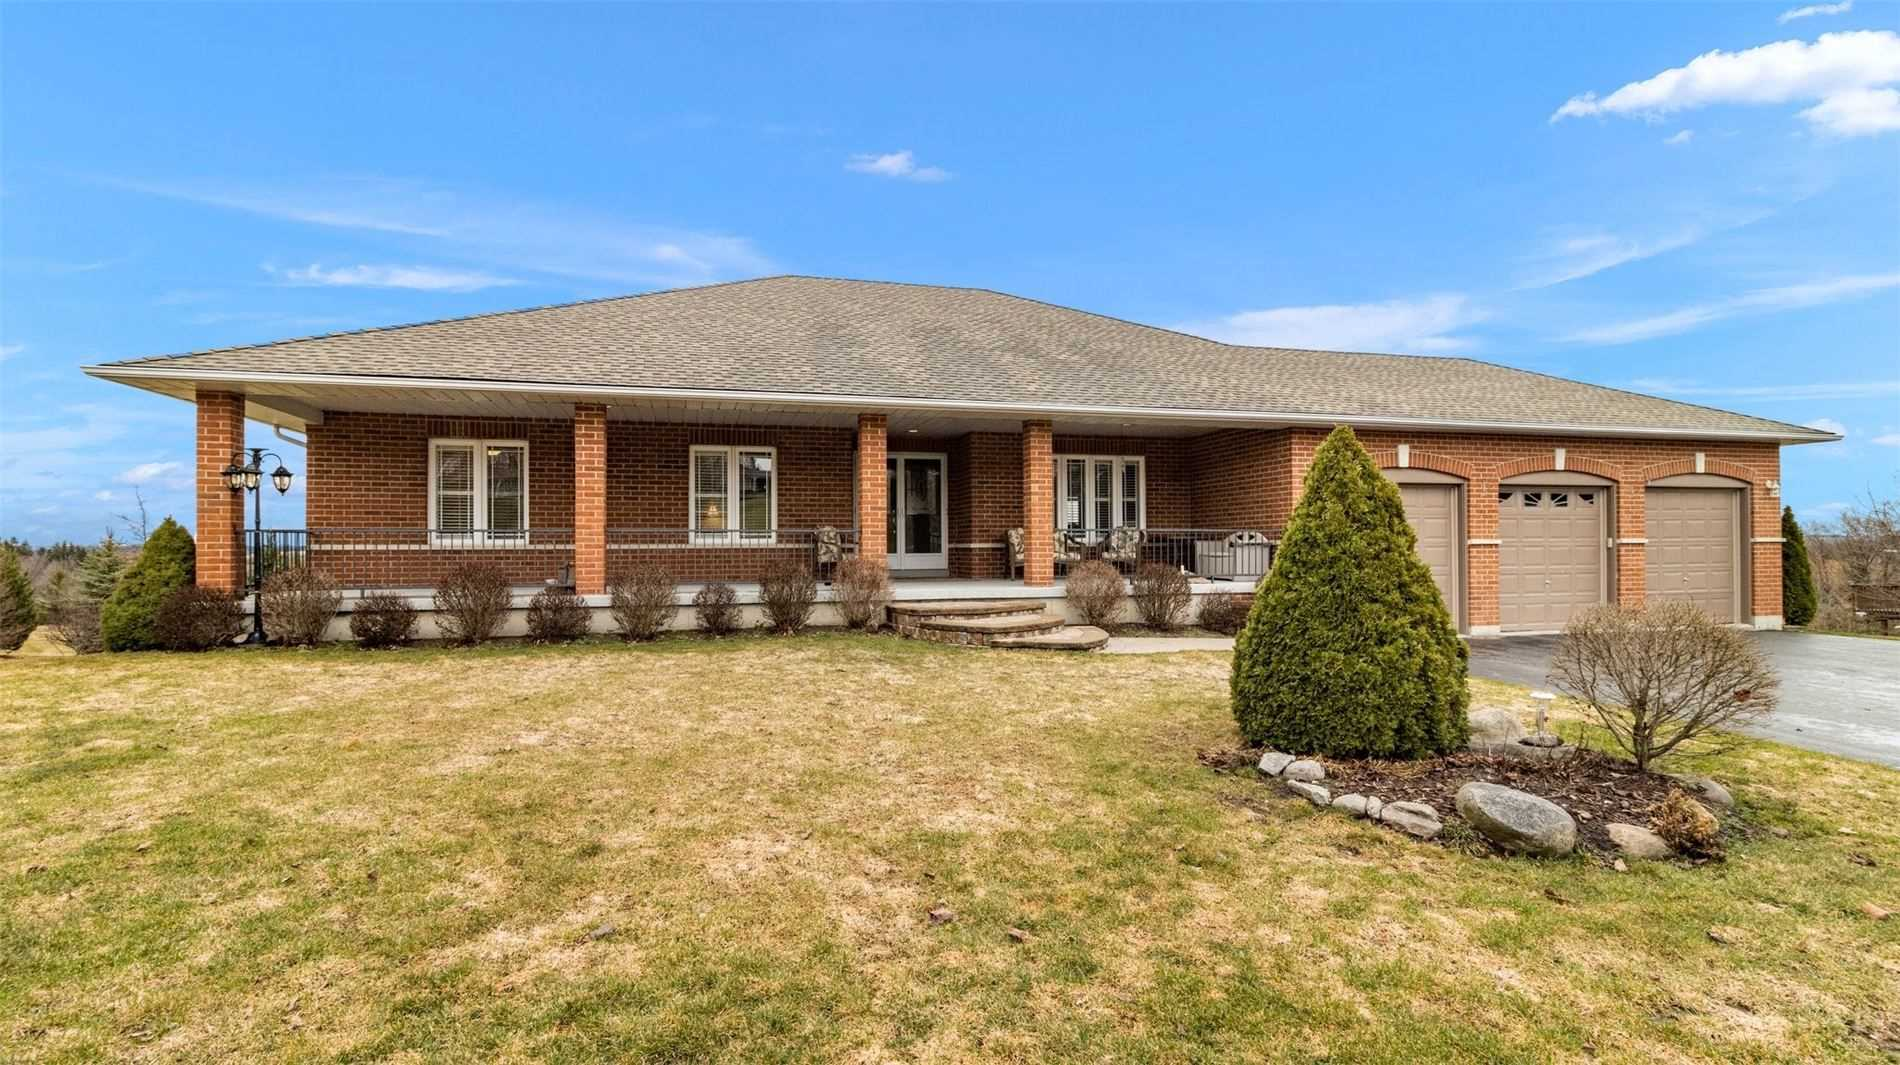 19 Kester Lane, Uxbridge, Ontario L0E1T0, 3 Bedrooms Bedrooms, ,2 BathroomsBathrooms,Detached,For Sale,Kester,N5171167